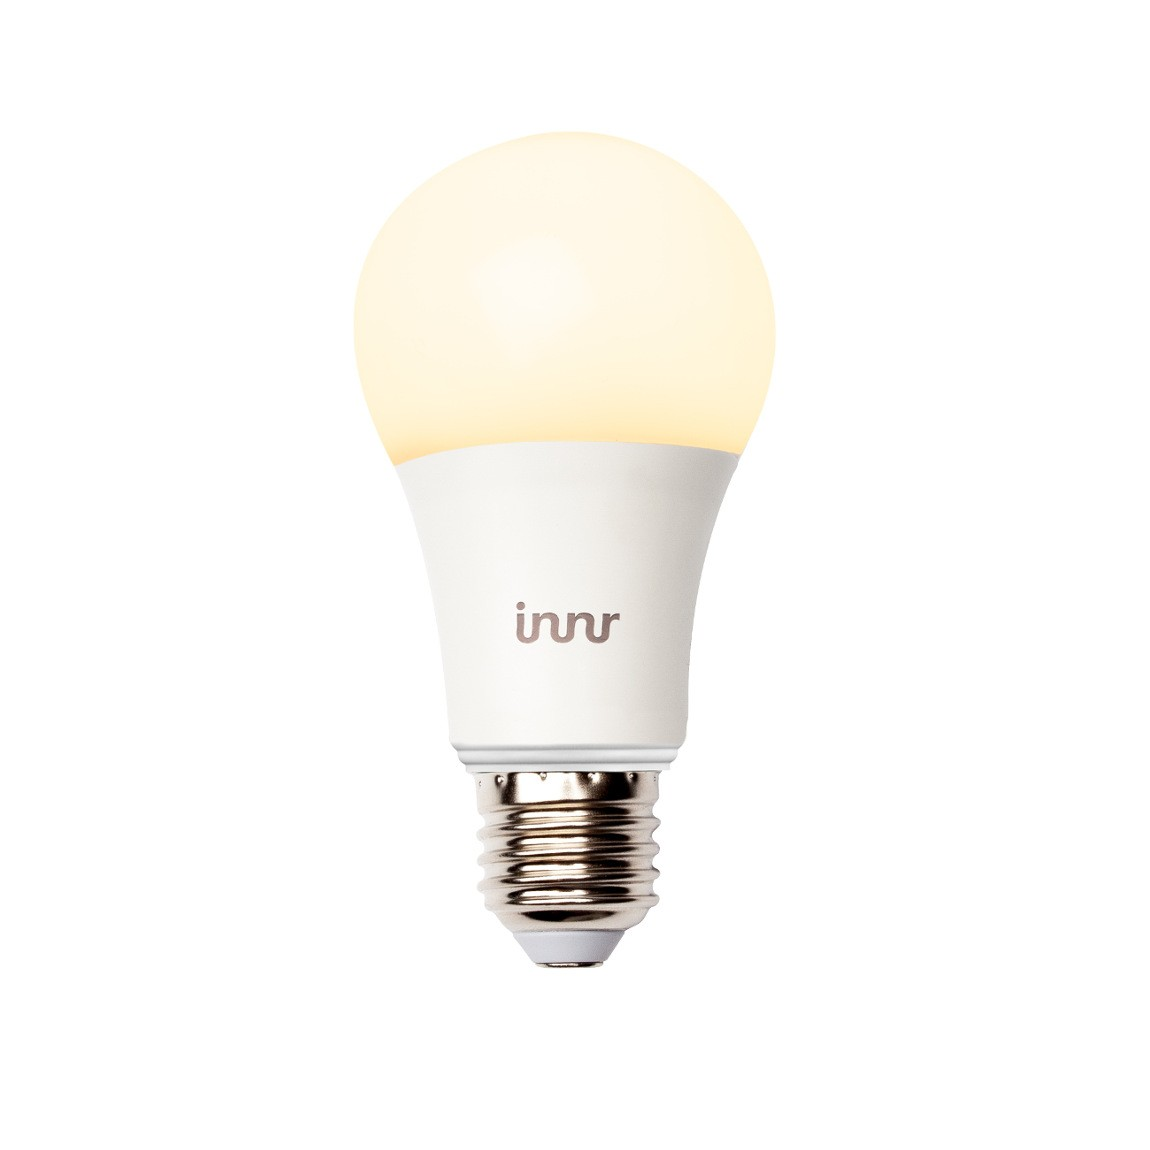 Innr Bulb RB 165 - LED-Lampe - Weiß